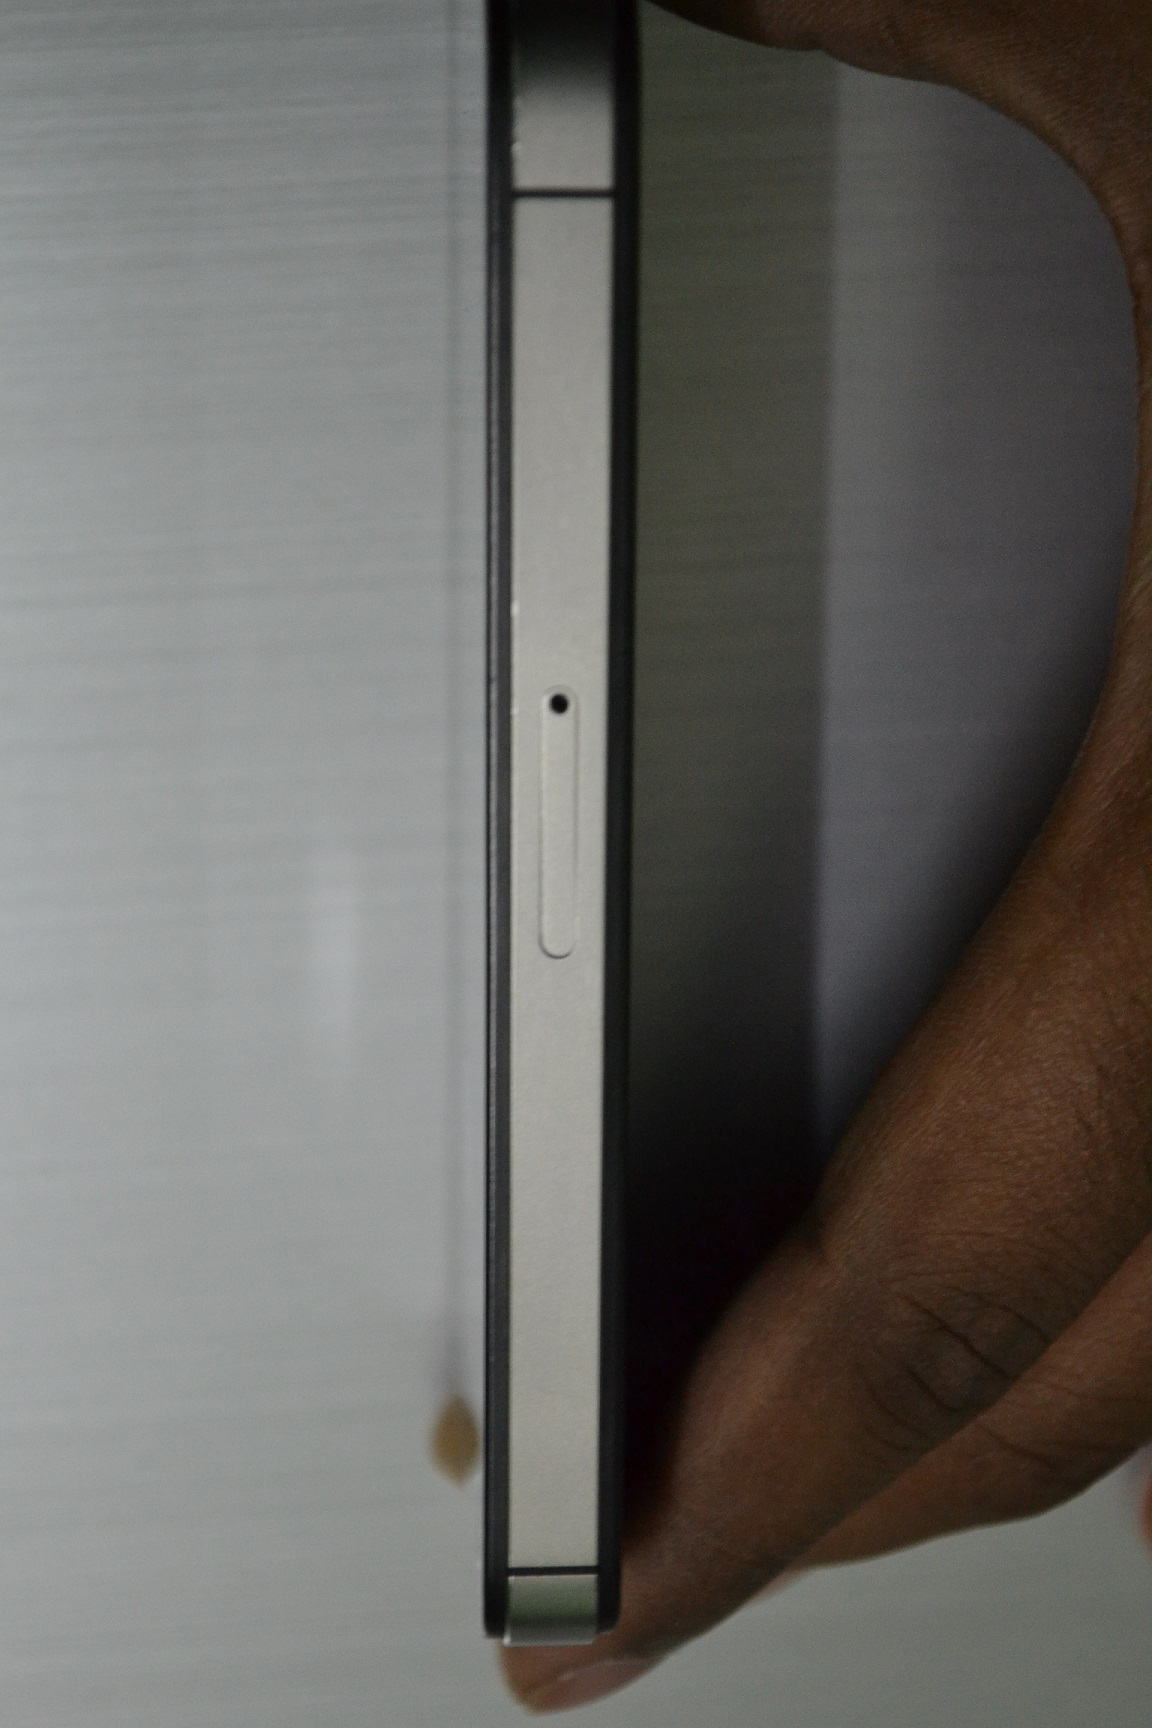 iPhone 4S (10).JPG